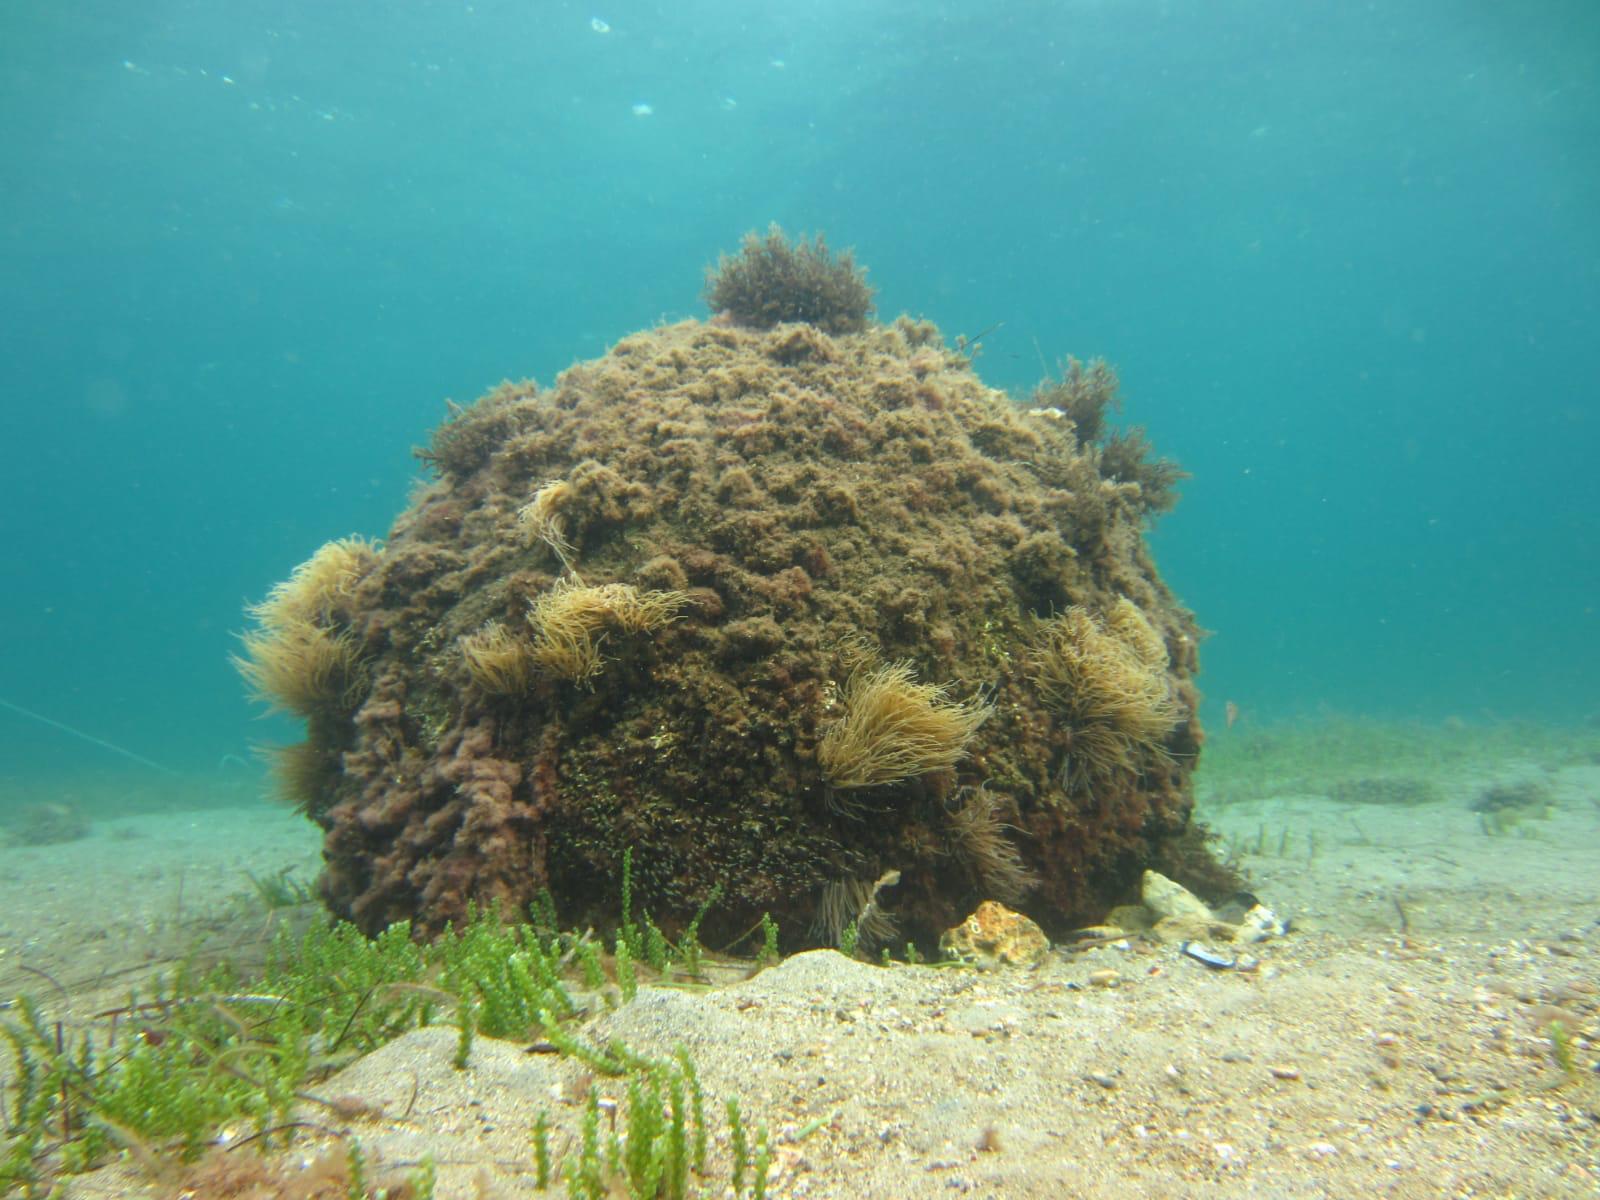 Birinci Dünya Savaşı'ndan kalma su altındaki mühimmat imha edildi